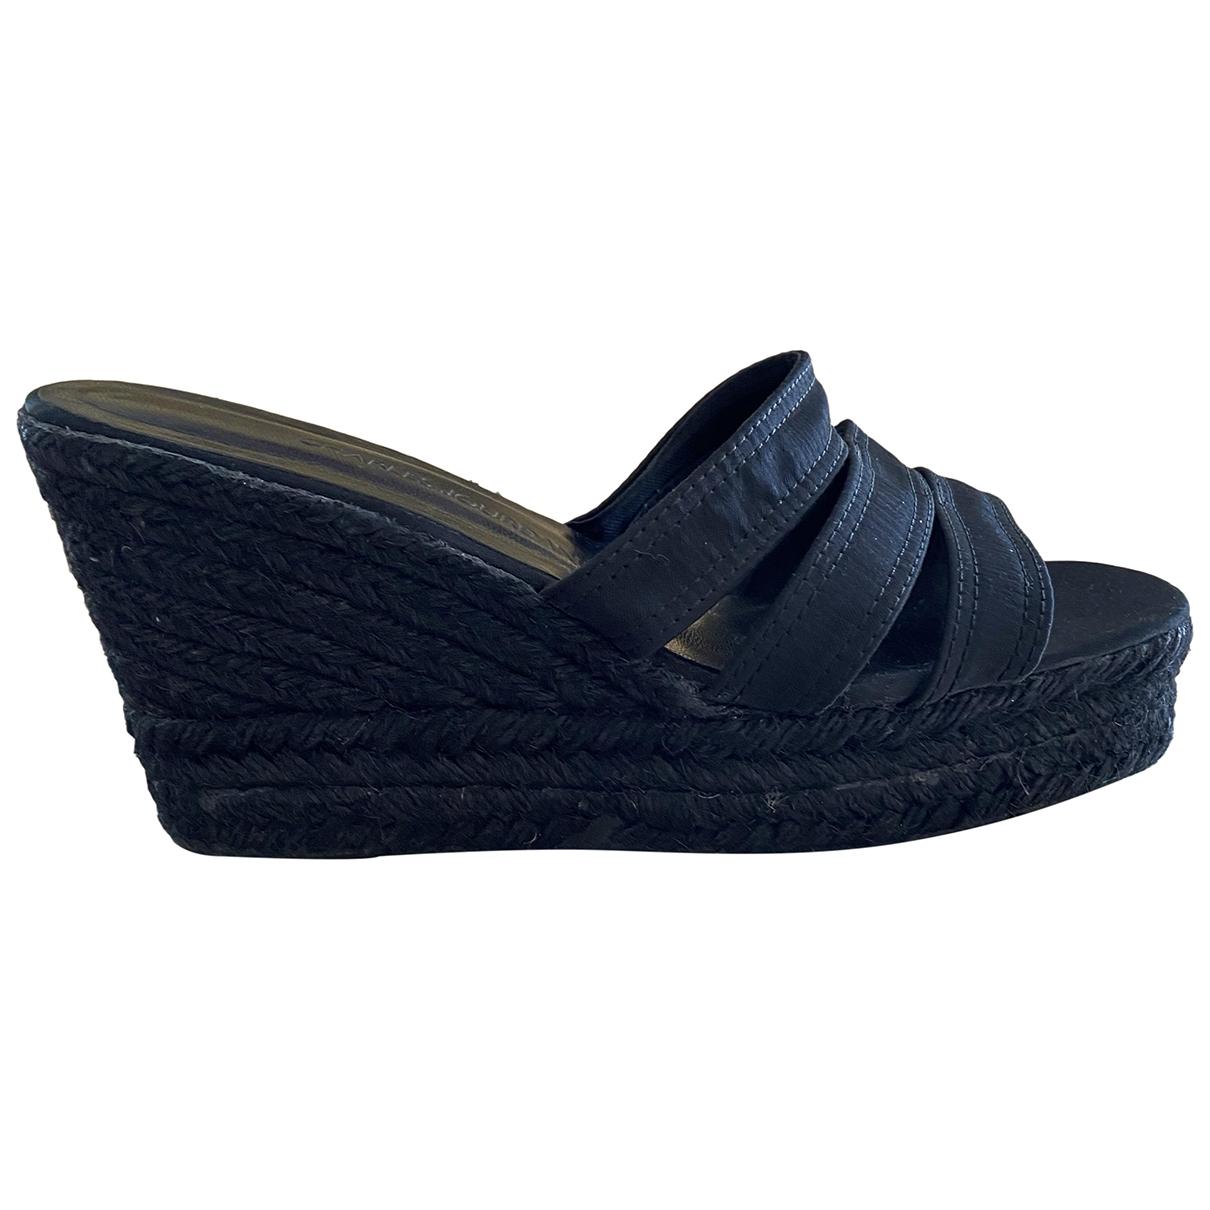 Charles Jourdan \N Black Cloth Sandals for Women 38 EU